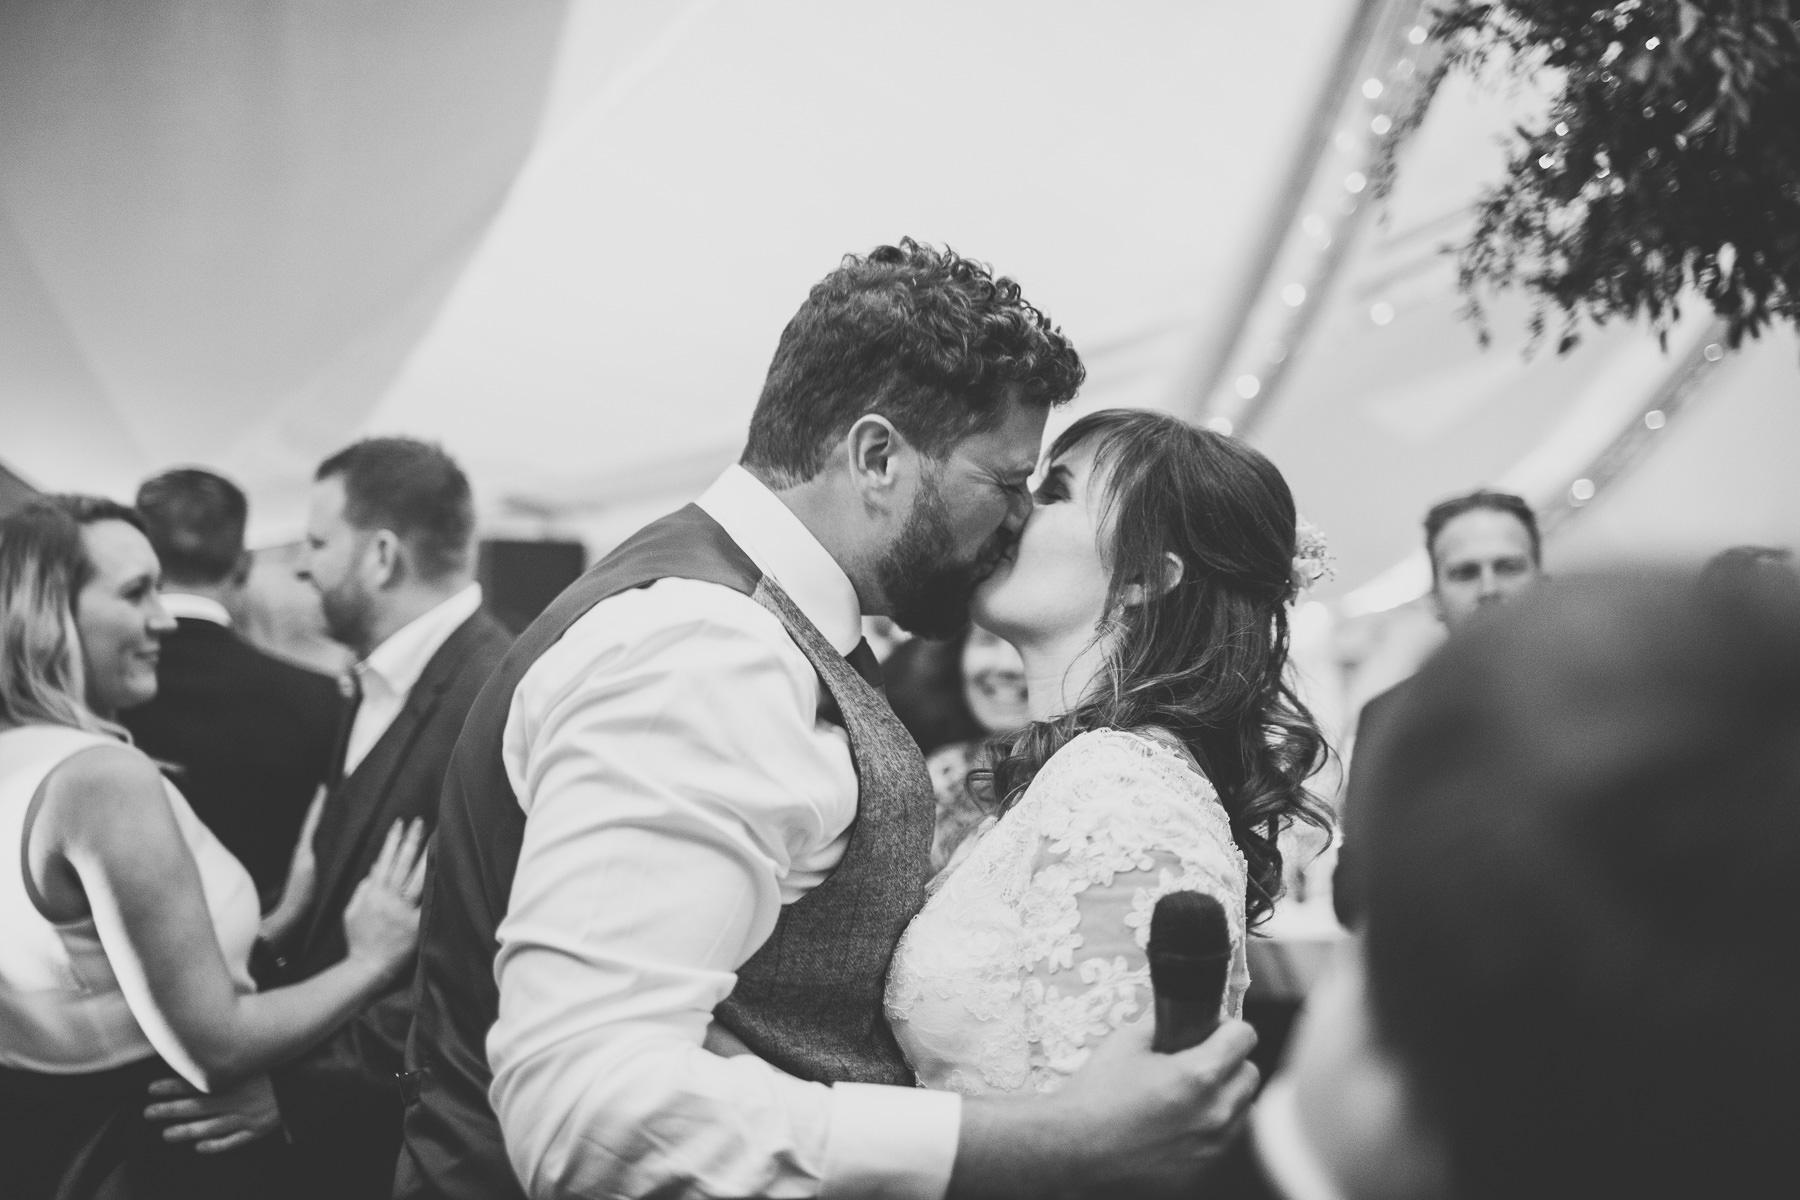 Pamber-Place-wedding-photography-basingstoke-hampshire-238